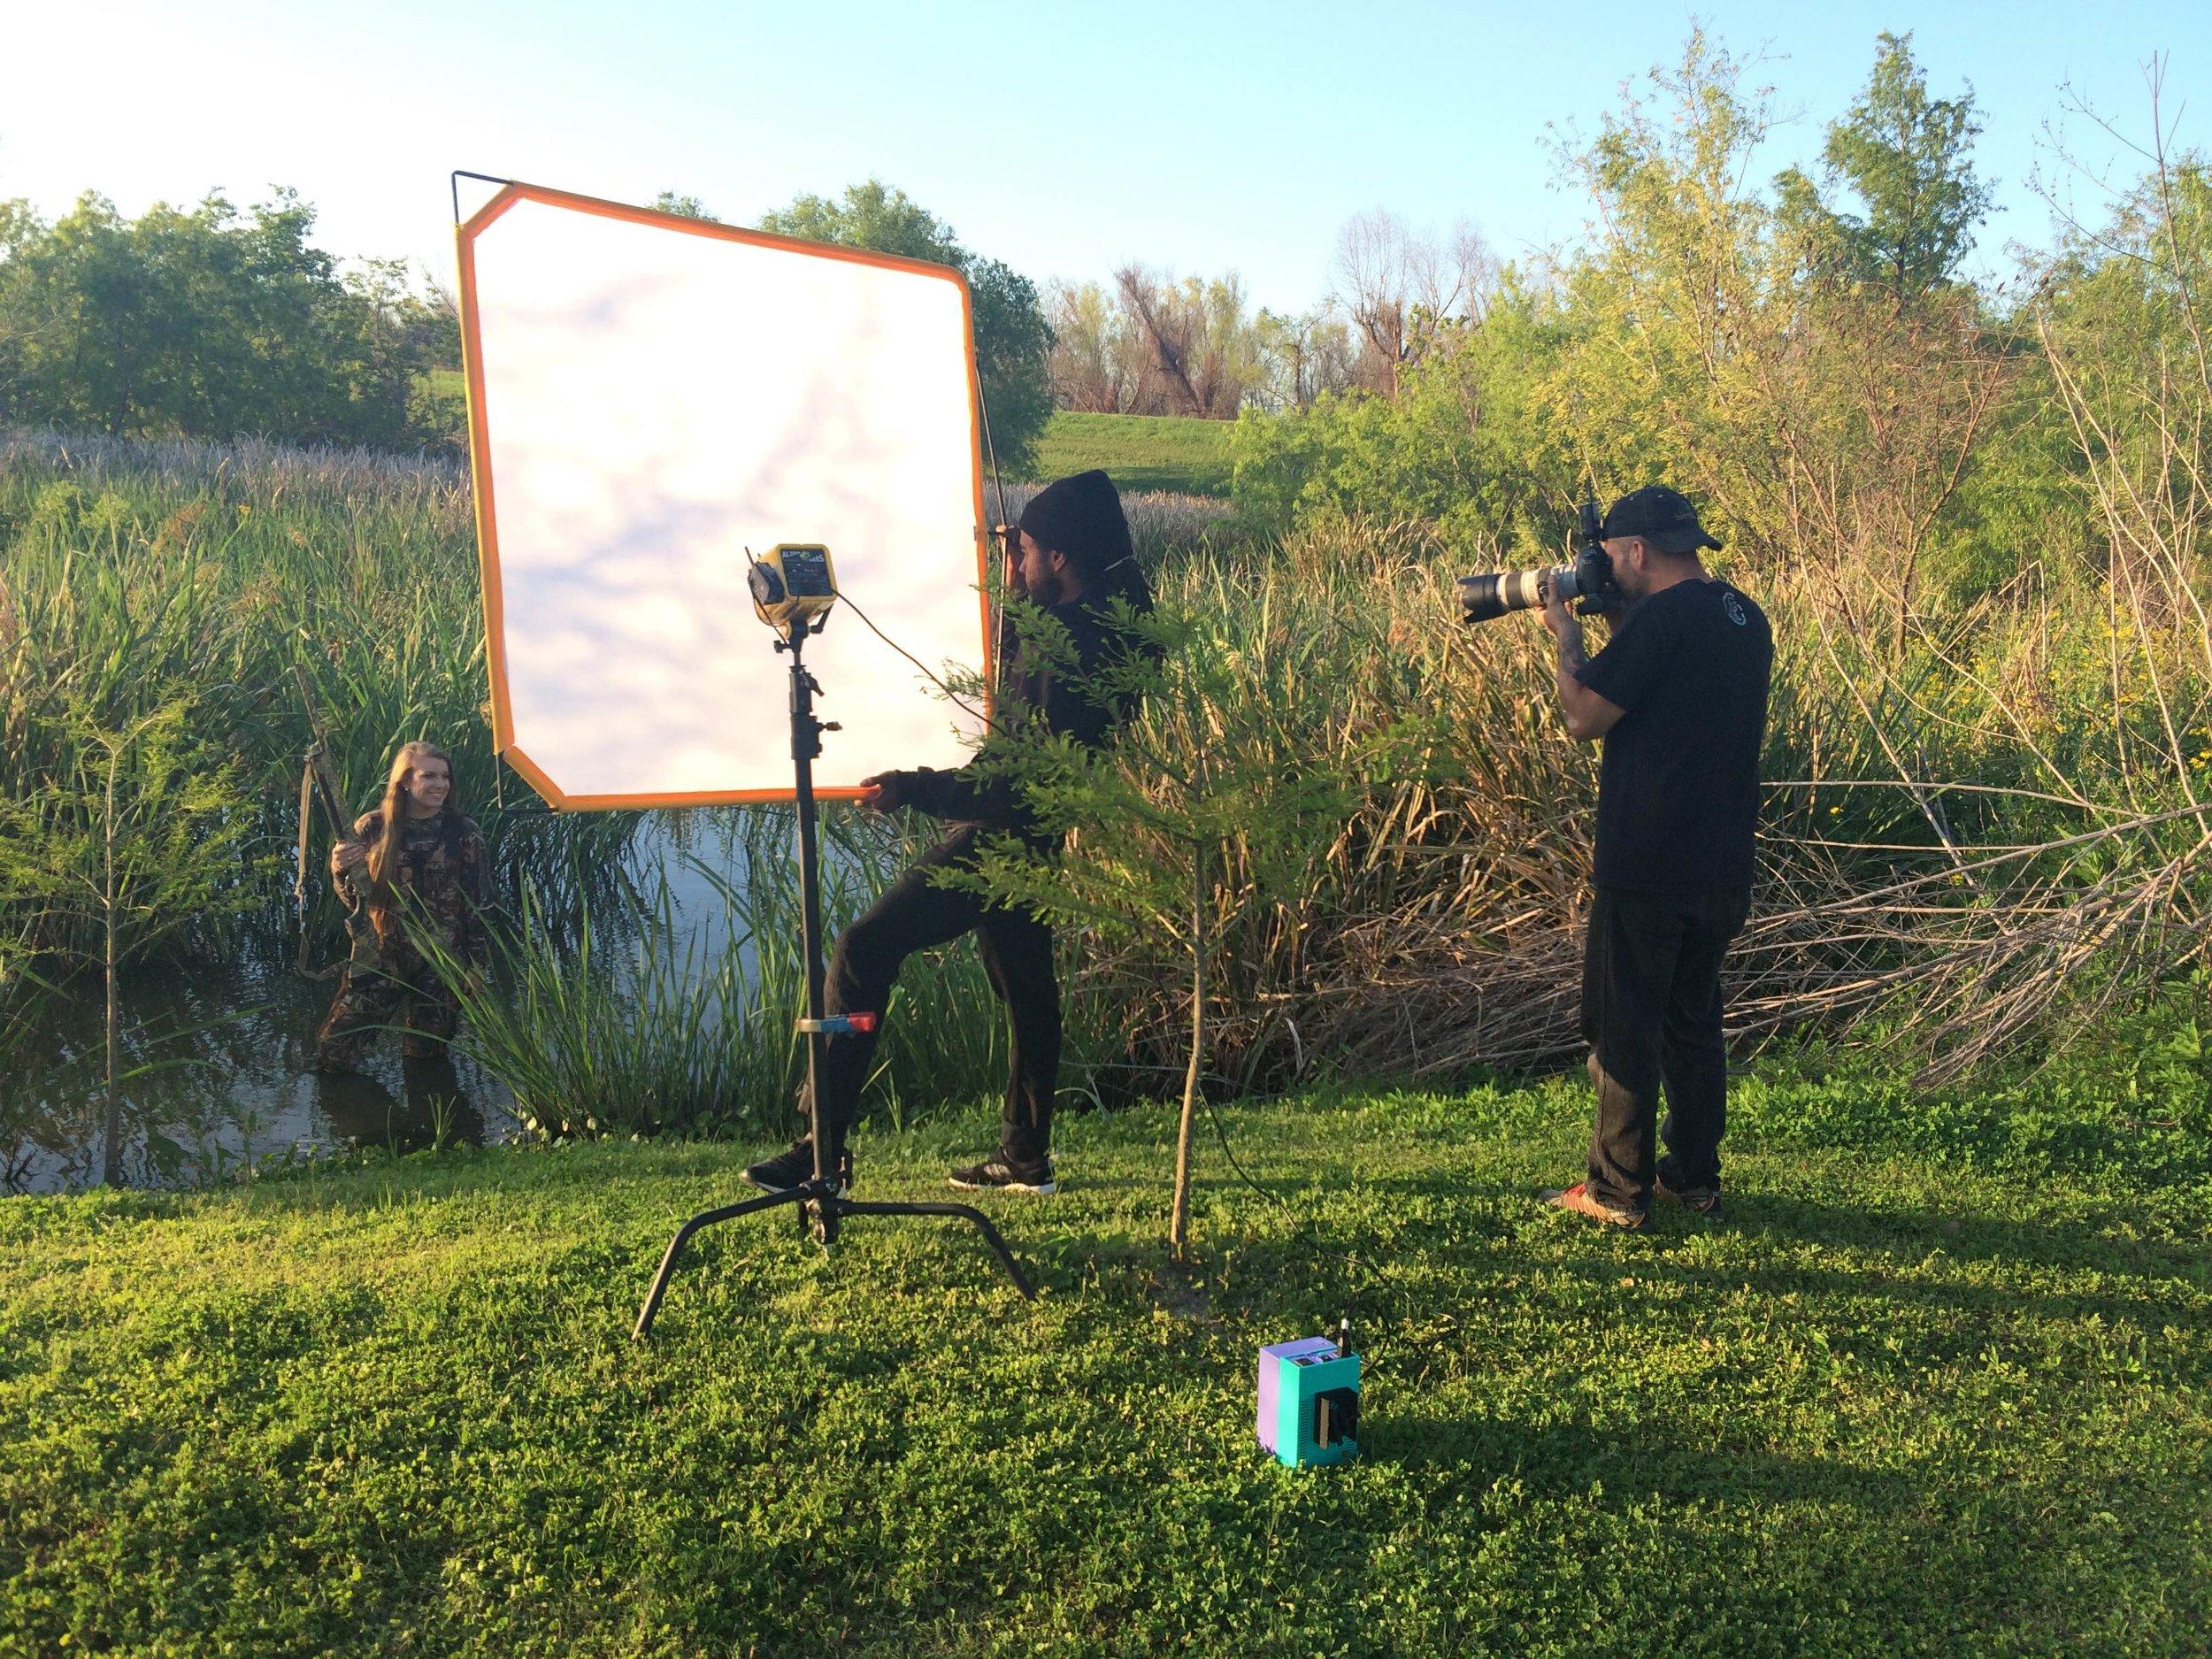 zack-smith-photography-environmental-portrait